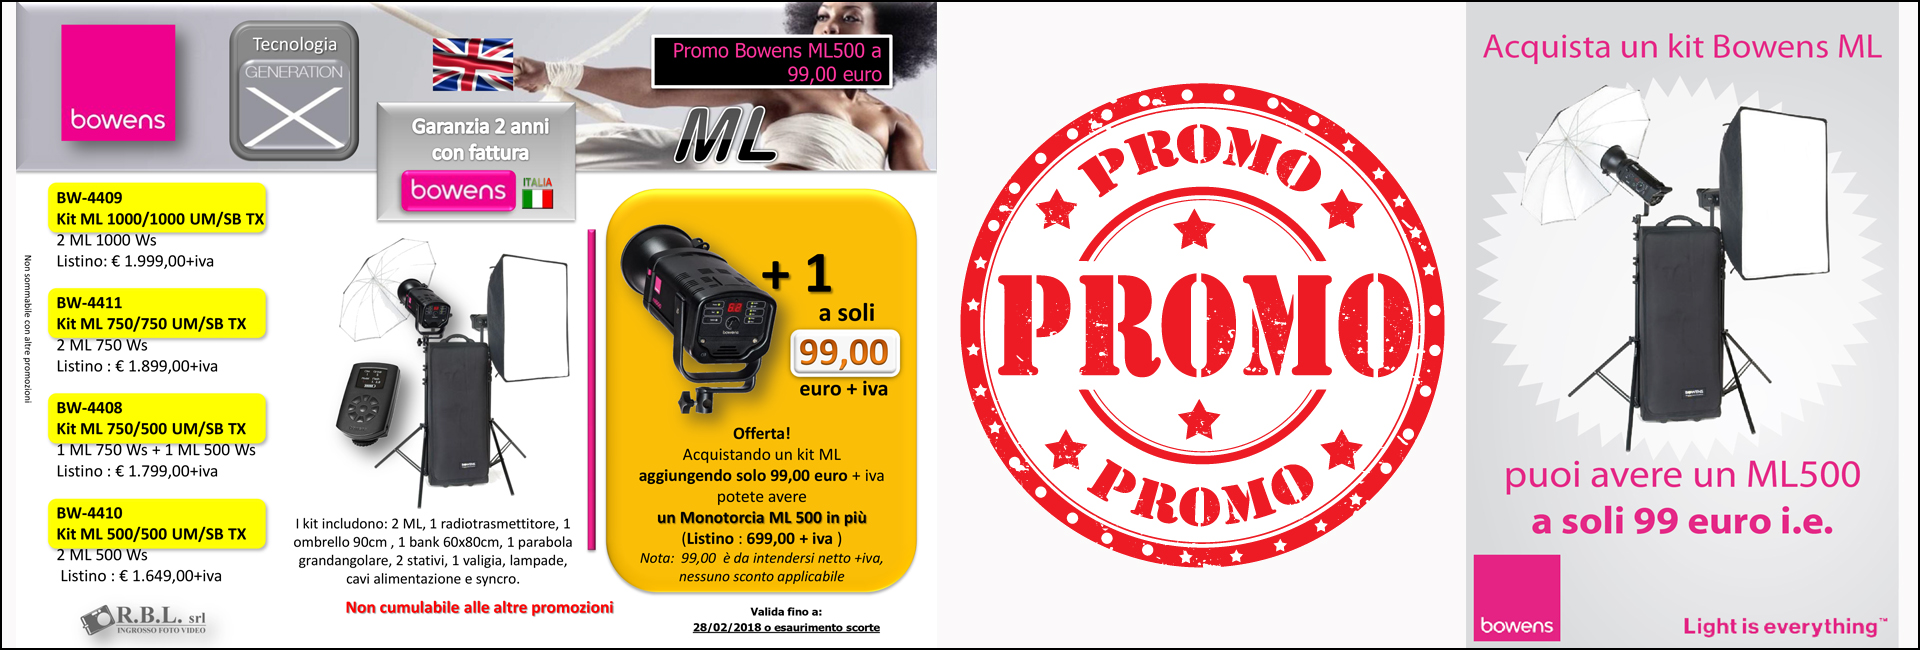 BOWENS promo